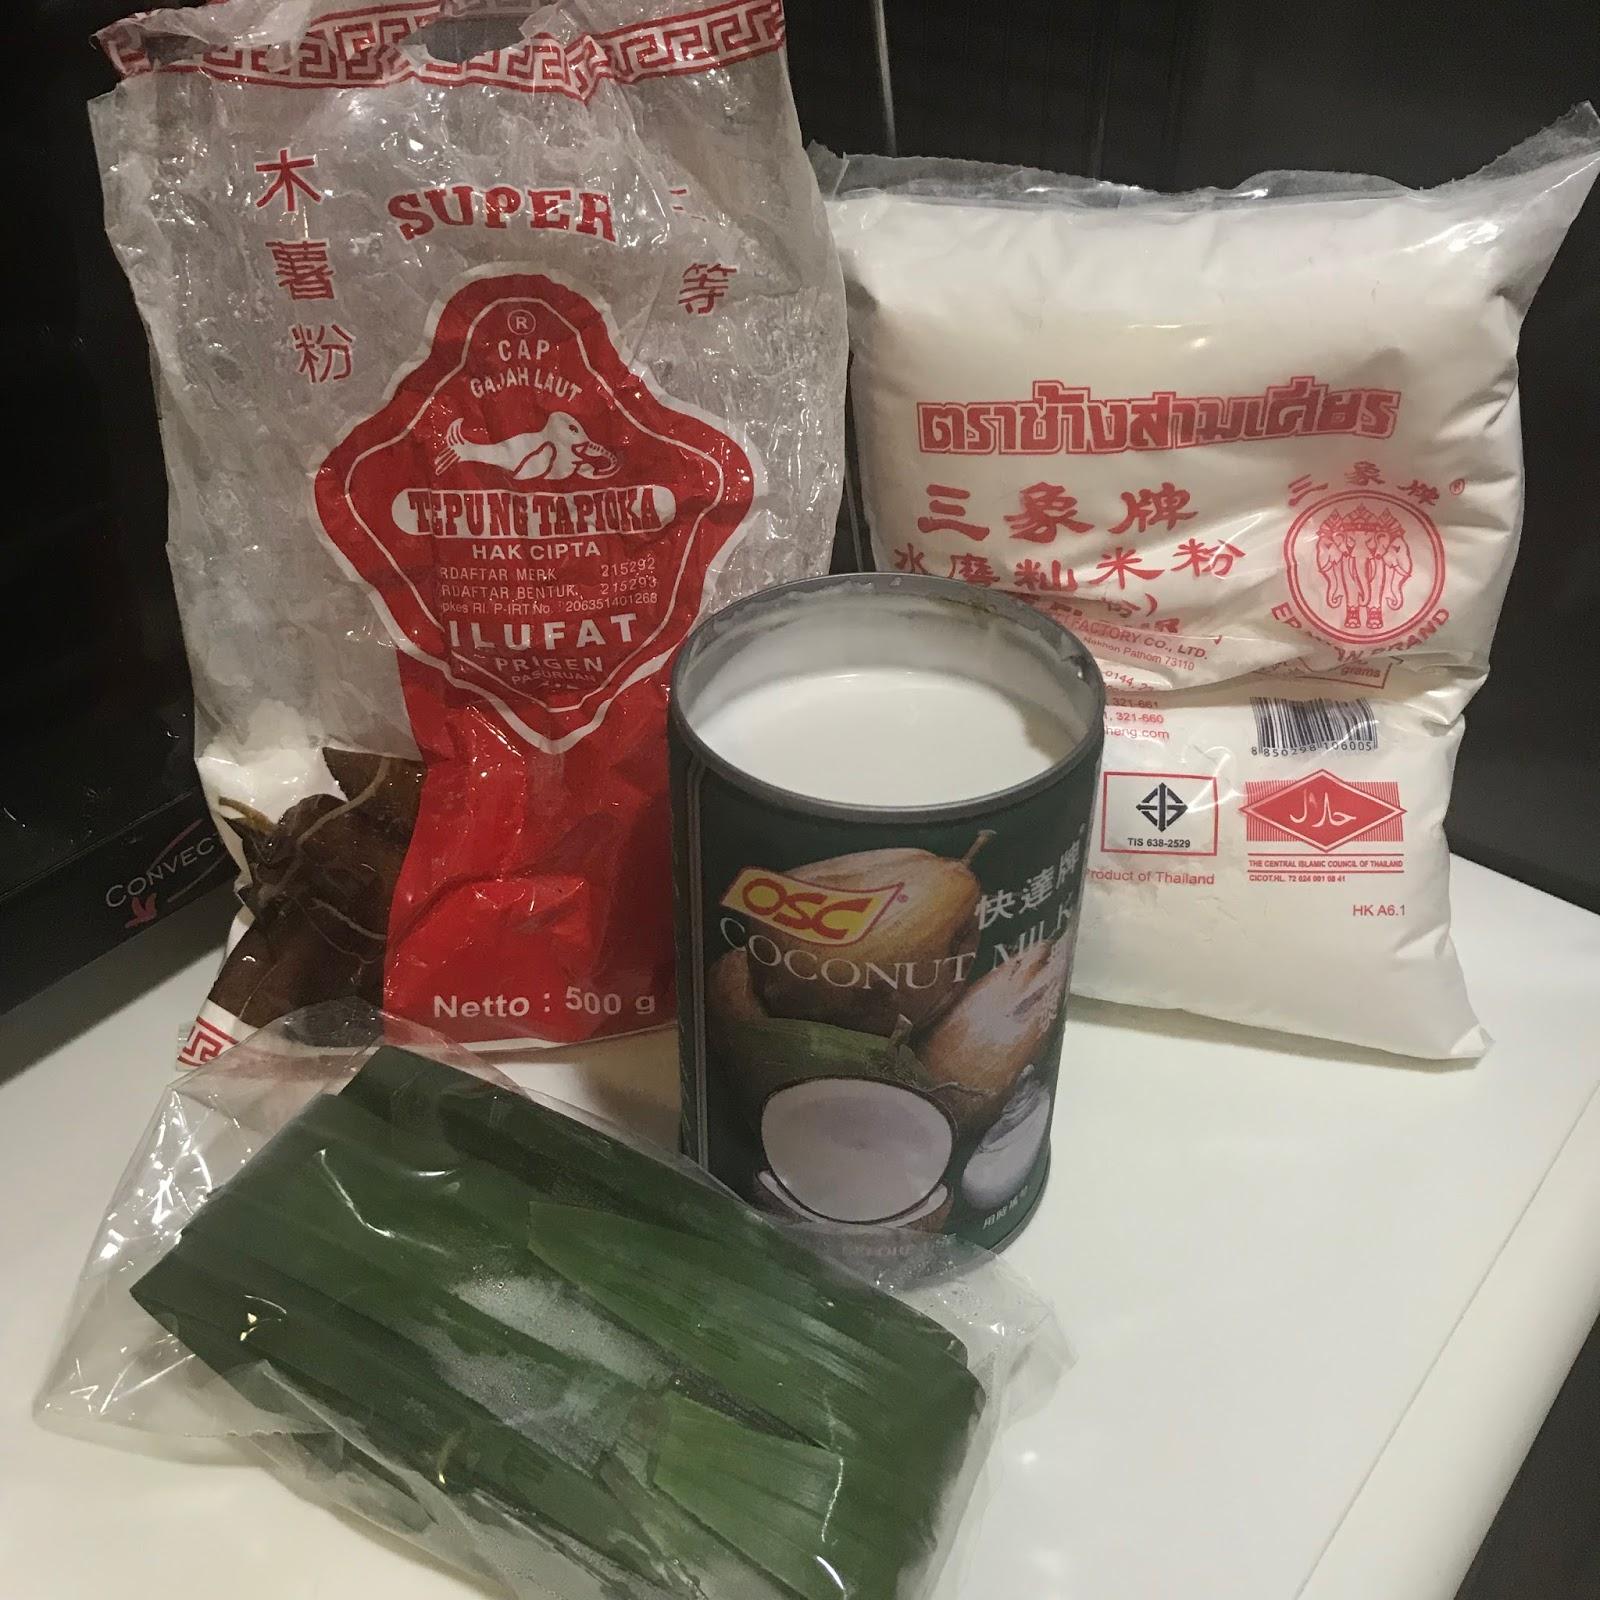 KinKi Sweet Home Bakery: 班蘭椰汁千層糕【13層的滋味】Pandan Coconut Layered Pudding